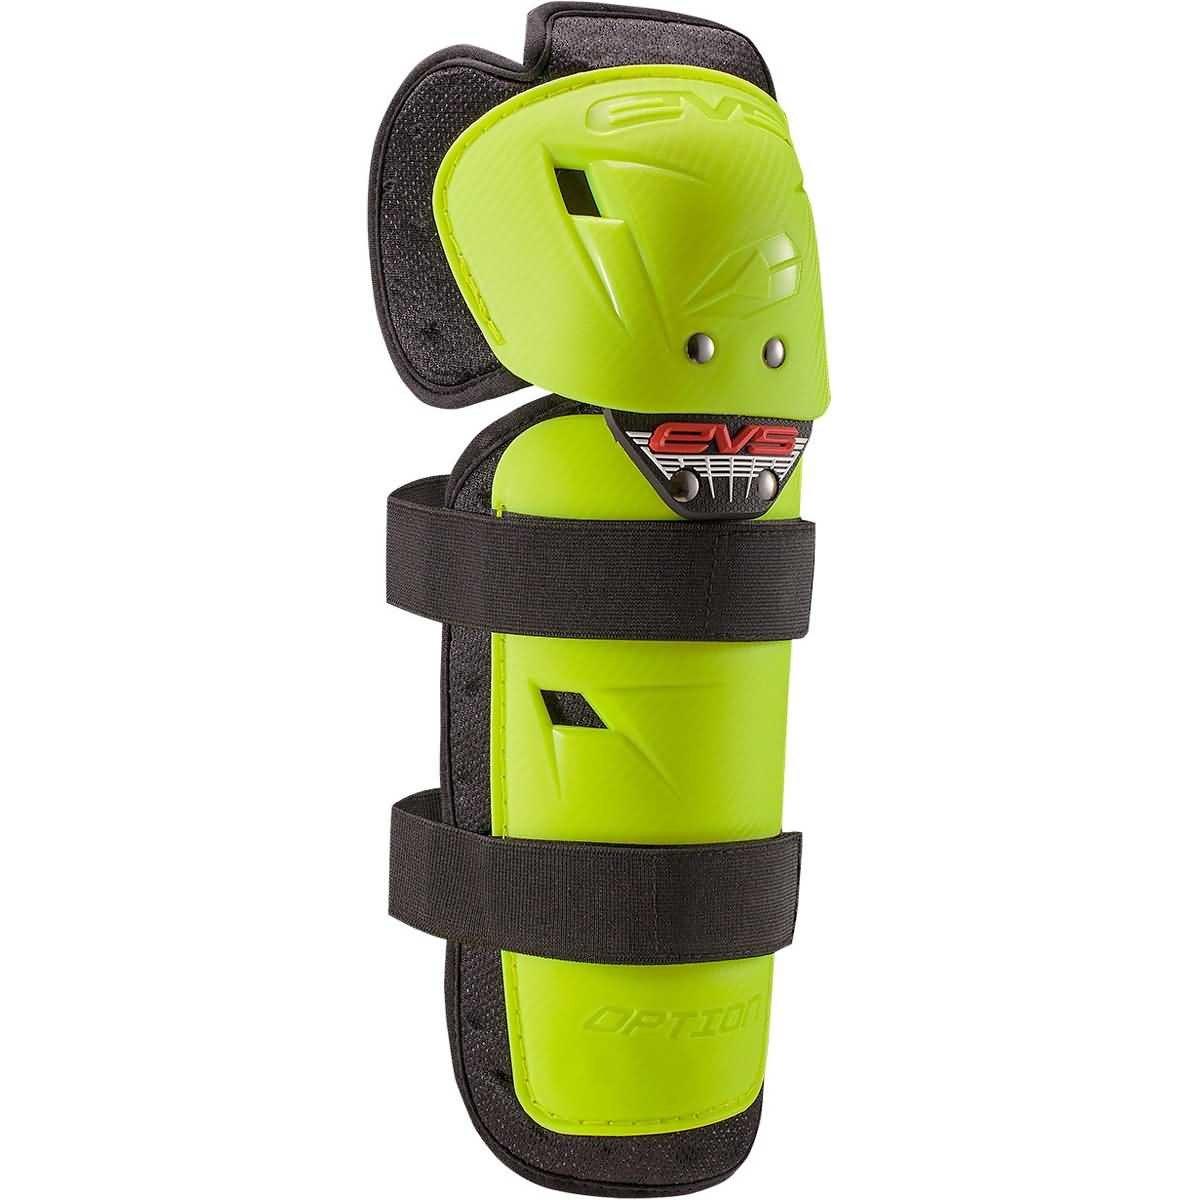 EVS 2016 Option Adult Knee Guard Off-Road Motorcycle Body Armor - Hi-Viz Yellow/One Size